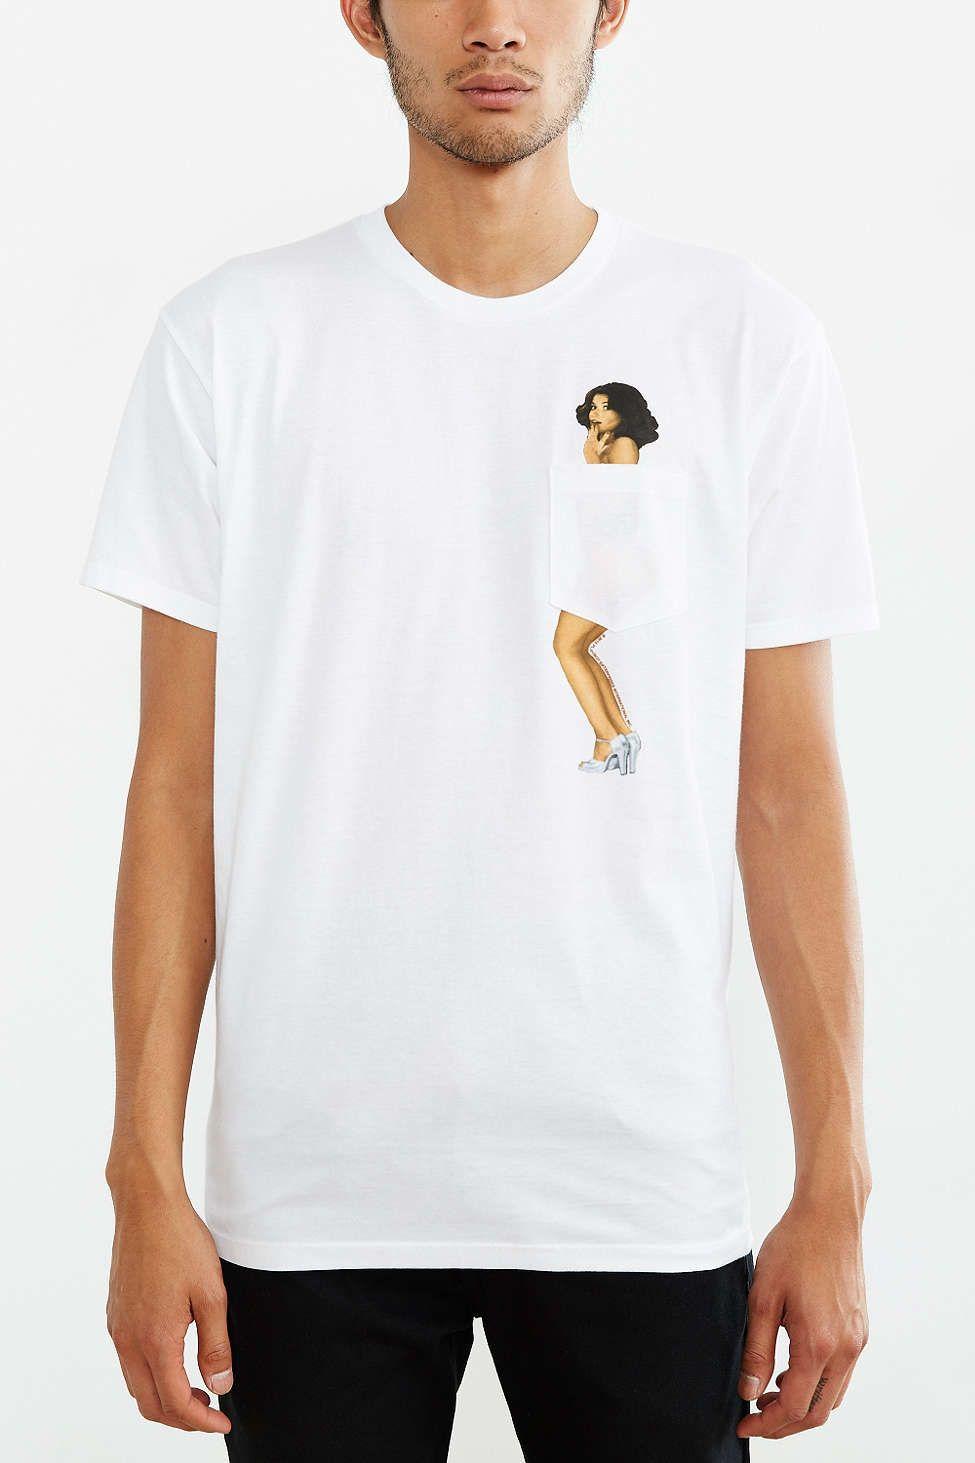 9dba4c8691c2 Junk Food Playboy Pocket Tee | T-Shirts | Mens tee shirts, Shirts ...